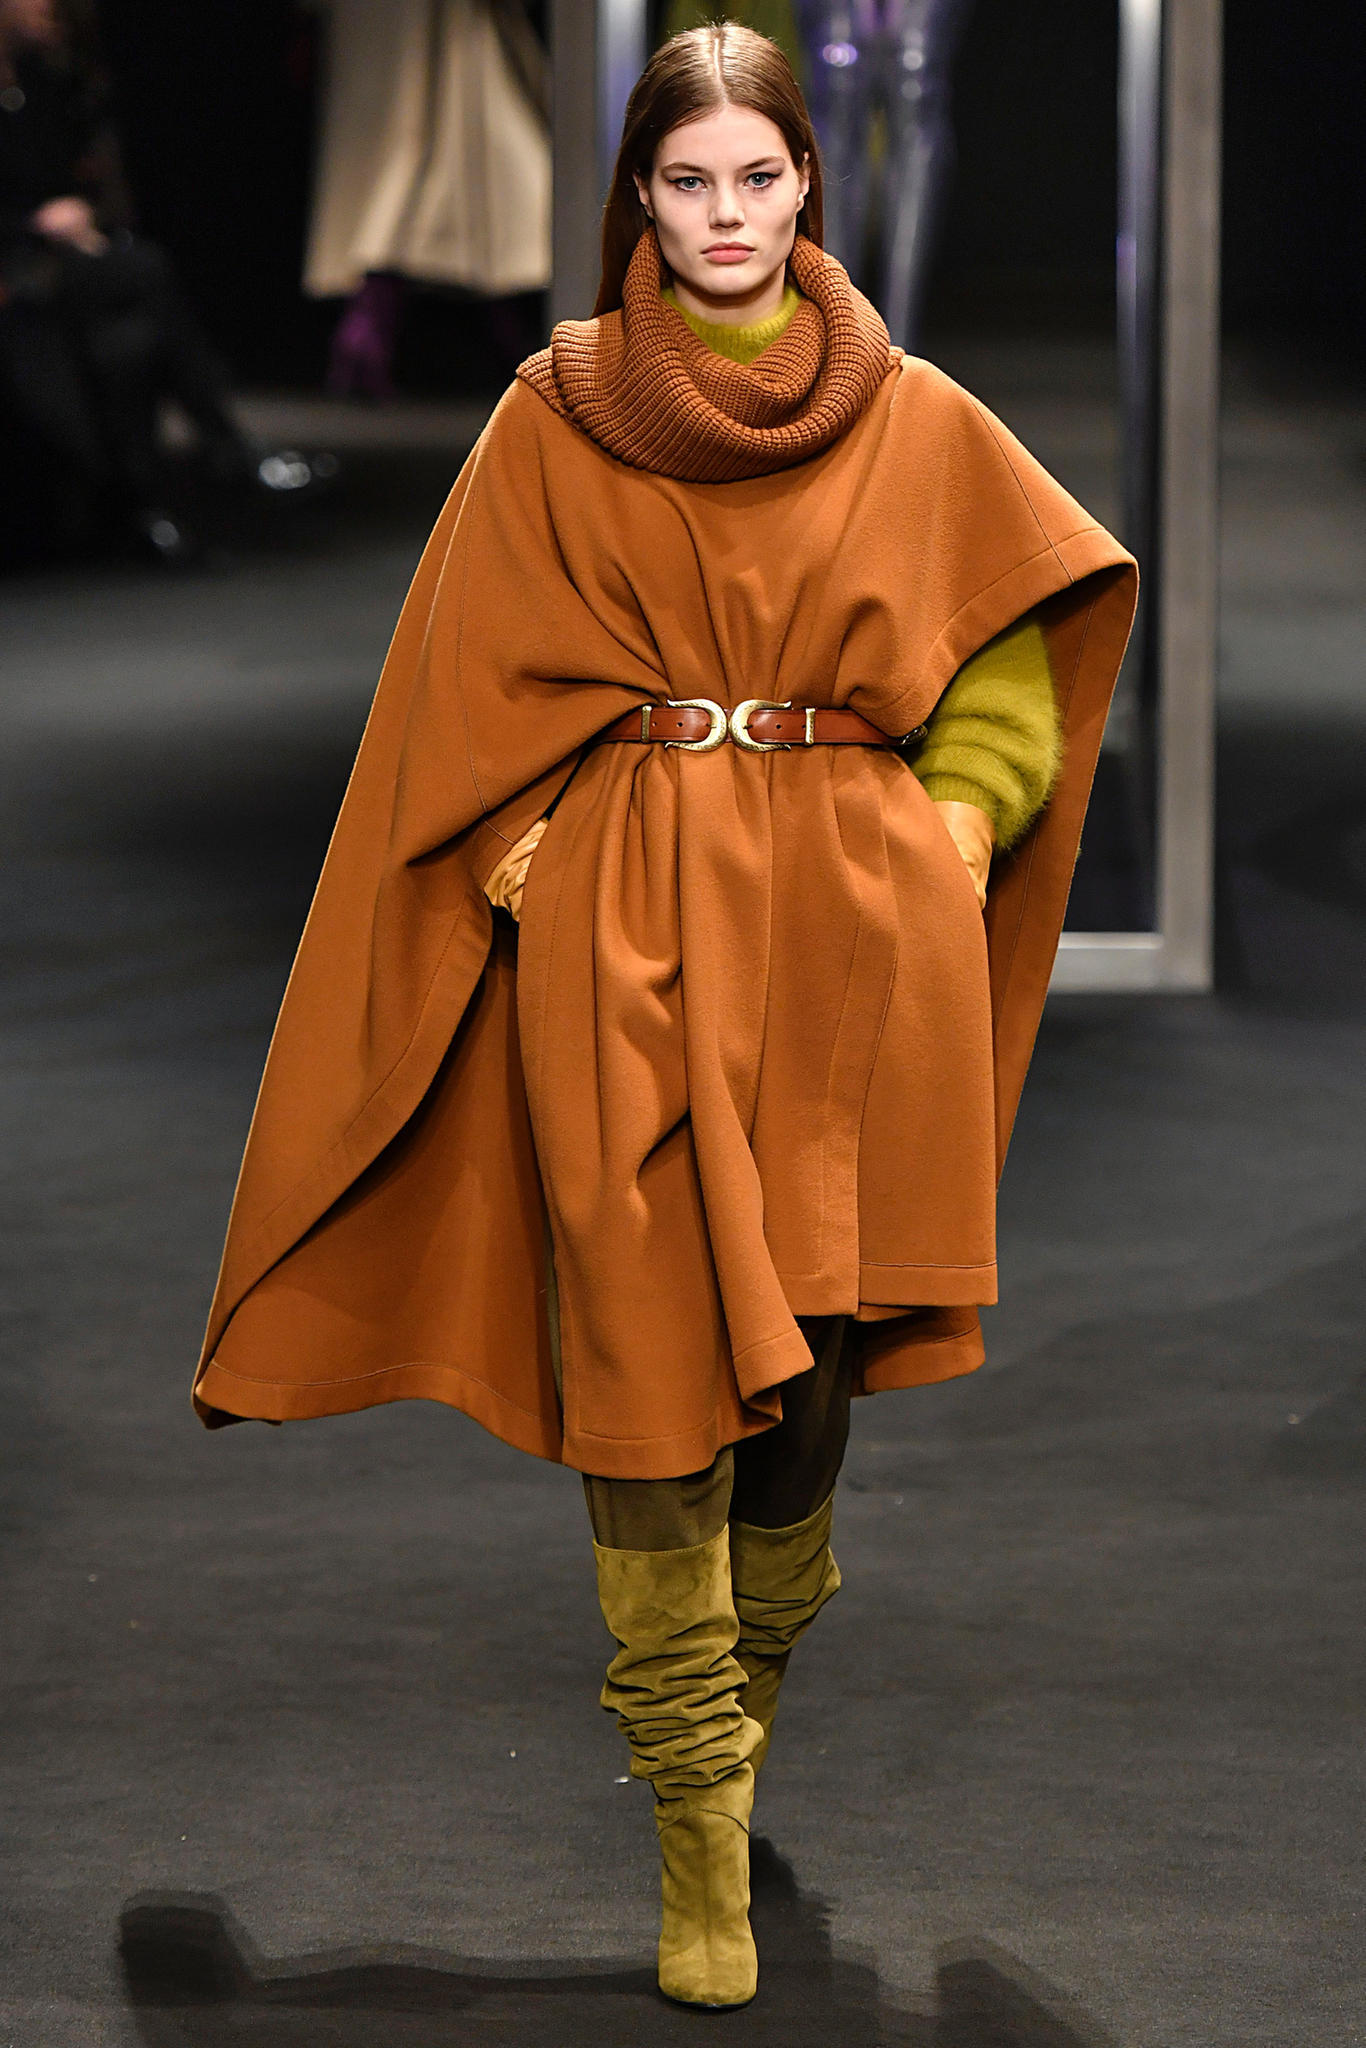 Mailand Fashion Week: Erdtöne bei Alberta Ferretti